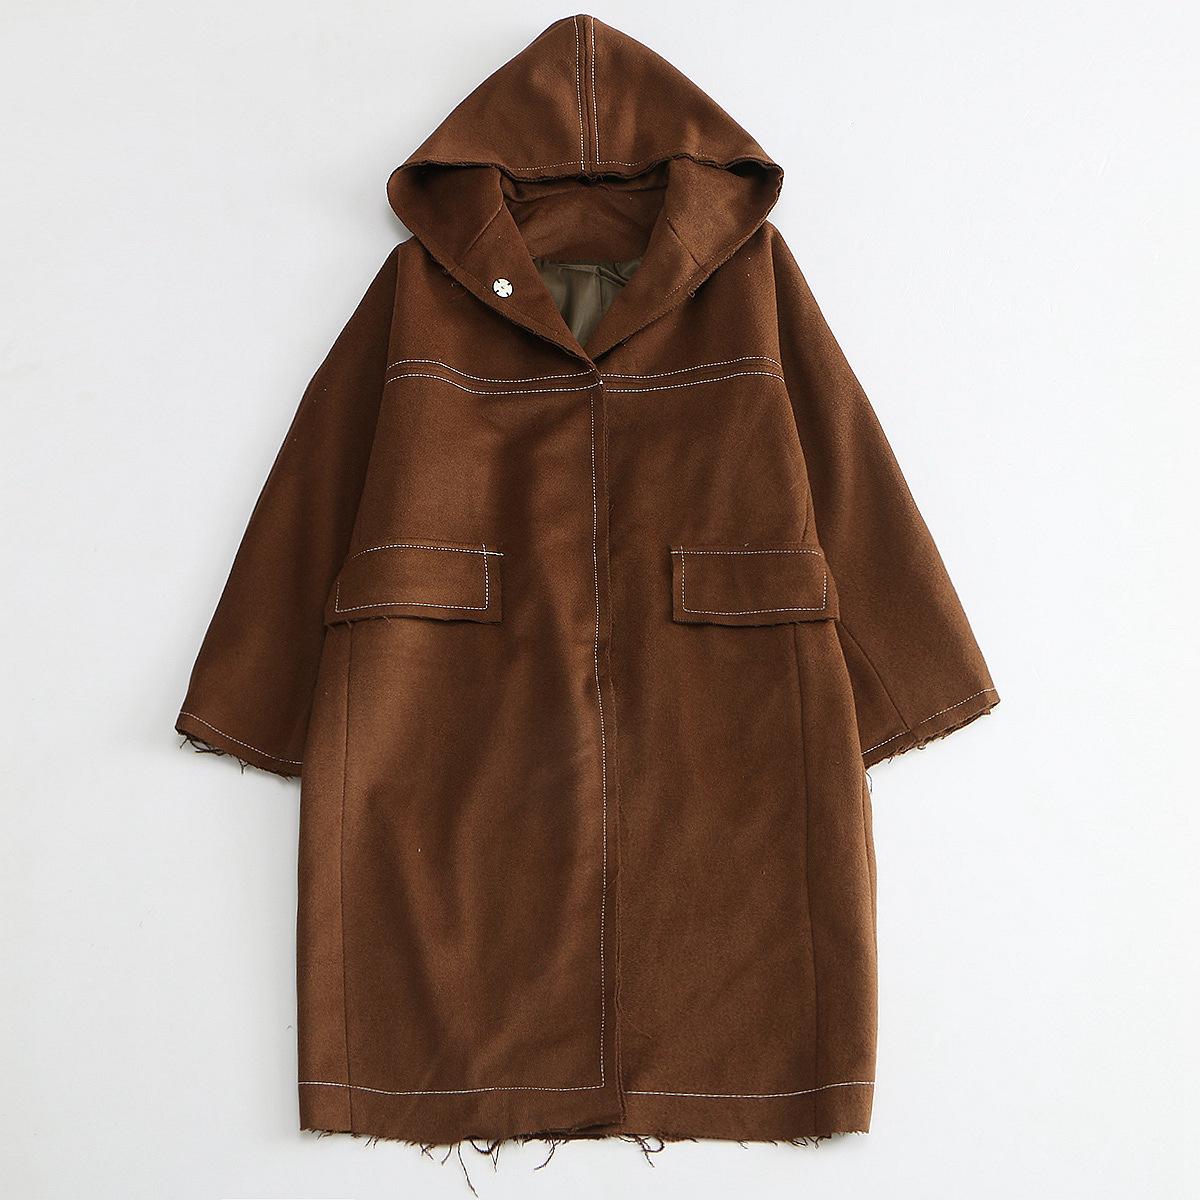 Qingmei ripe loyal dog retro hooded woolen coat female cloak Han Qiudong student woolen coat